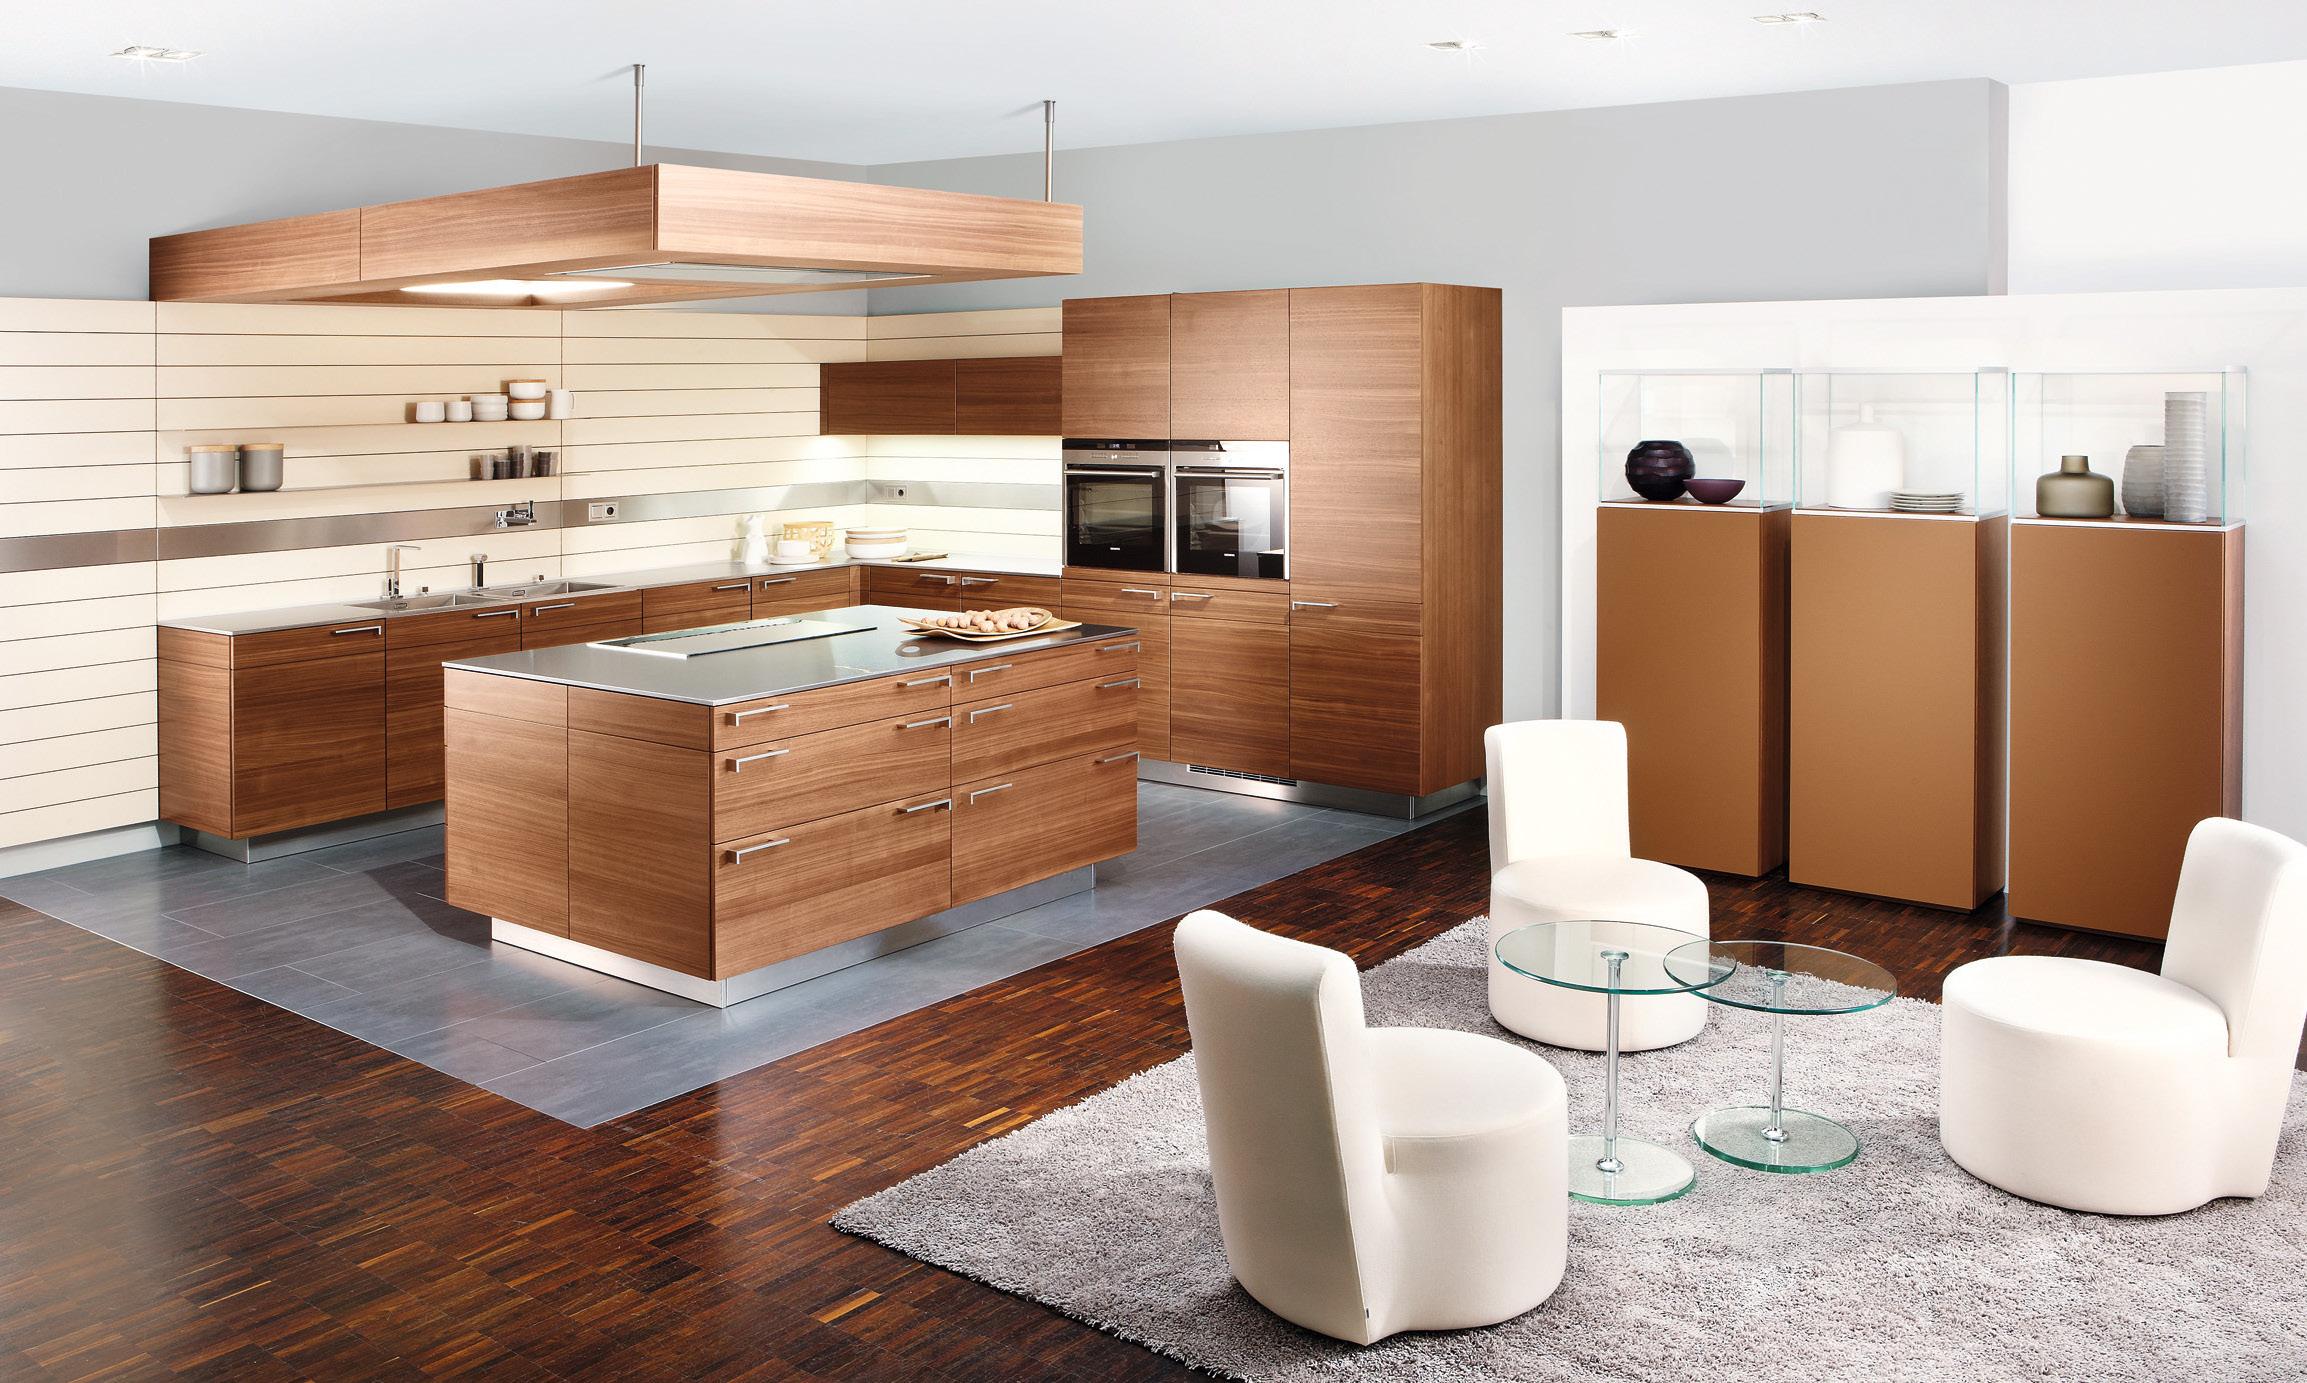 sacramento kitchen cabinets german kitchen cabinets Courtesy of Poggenpohl